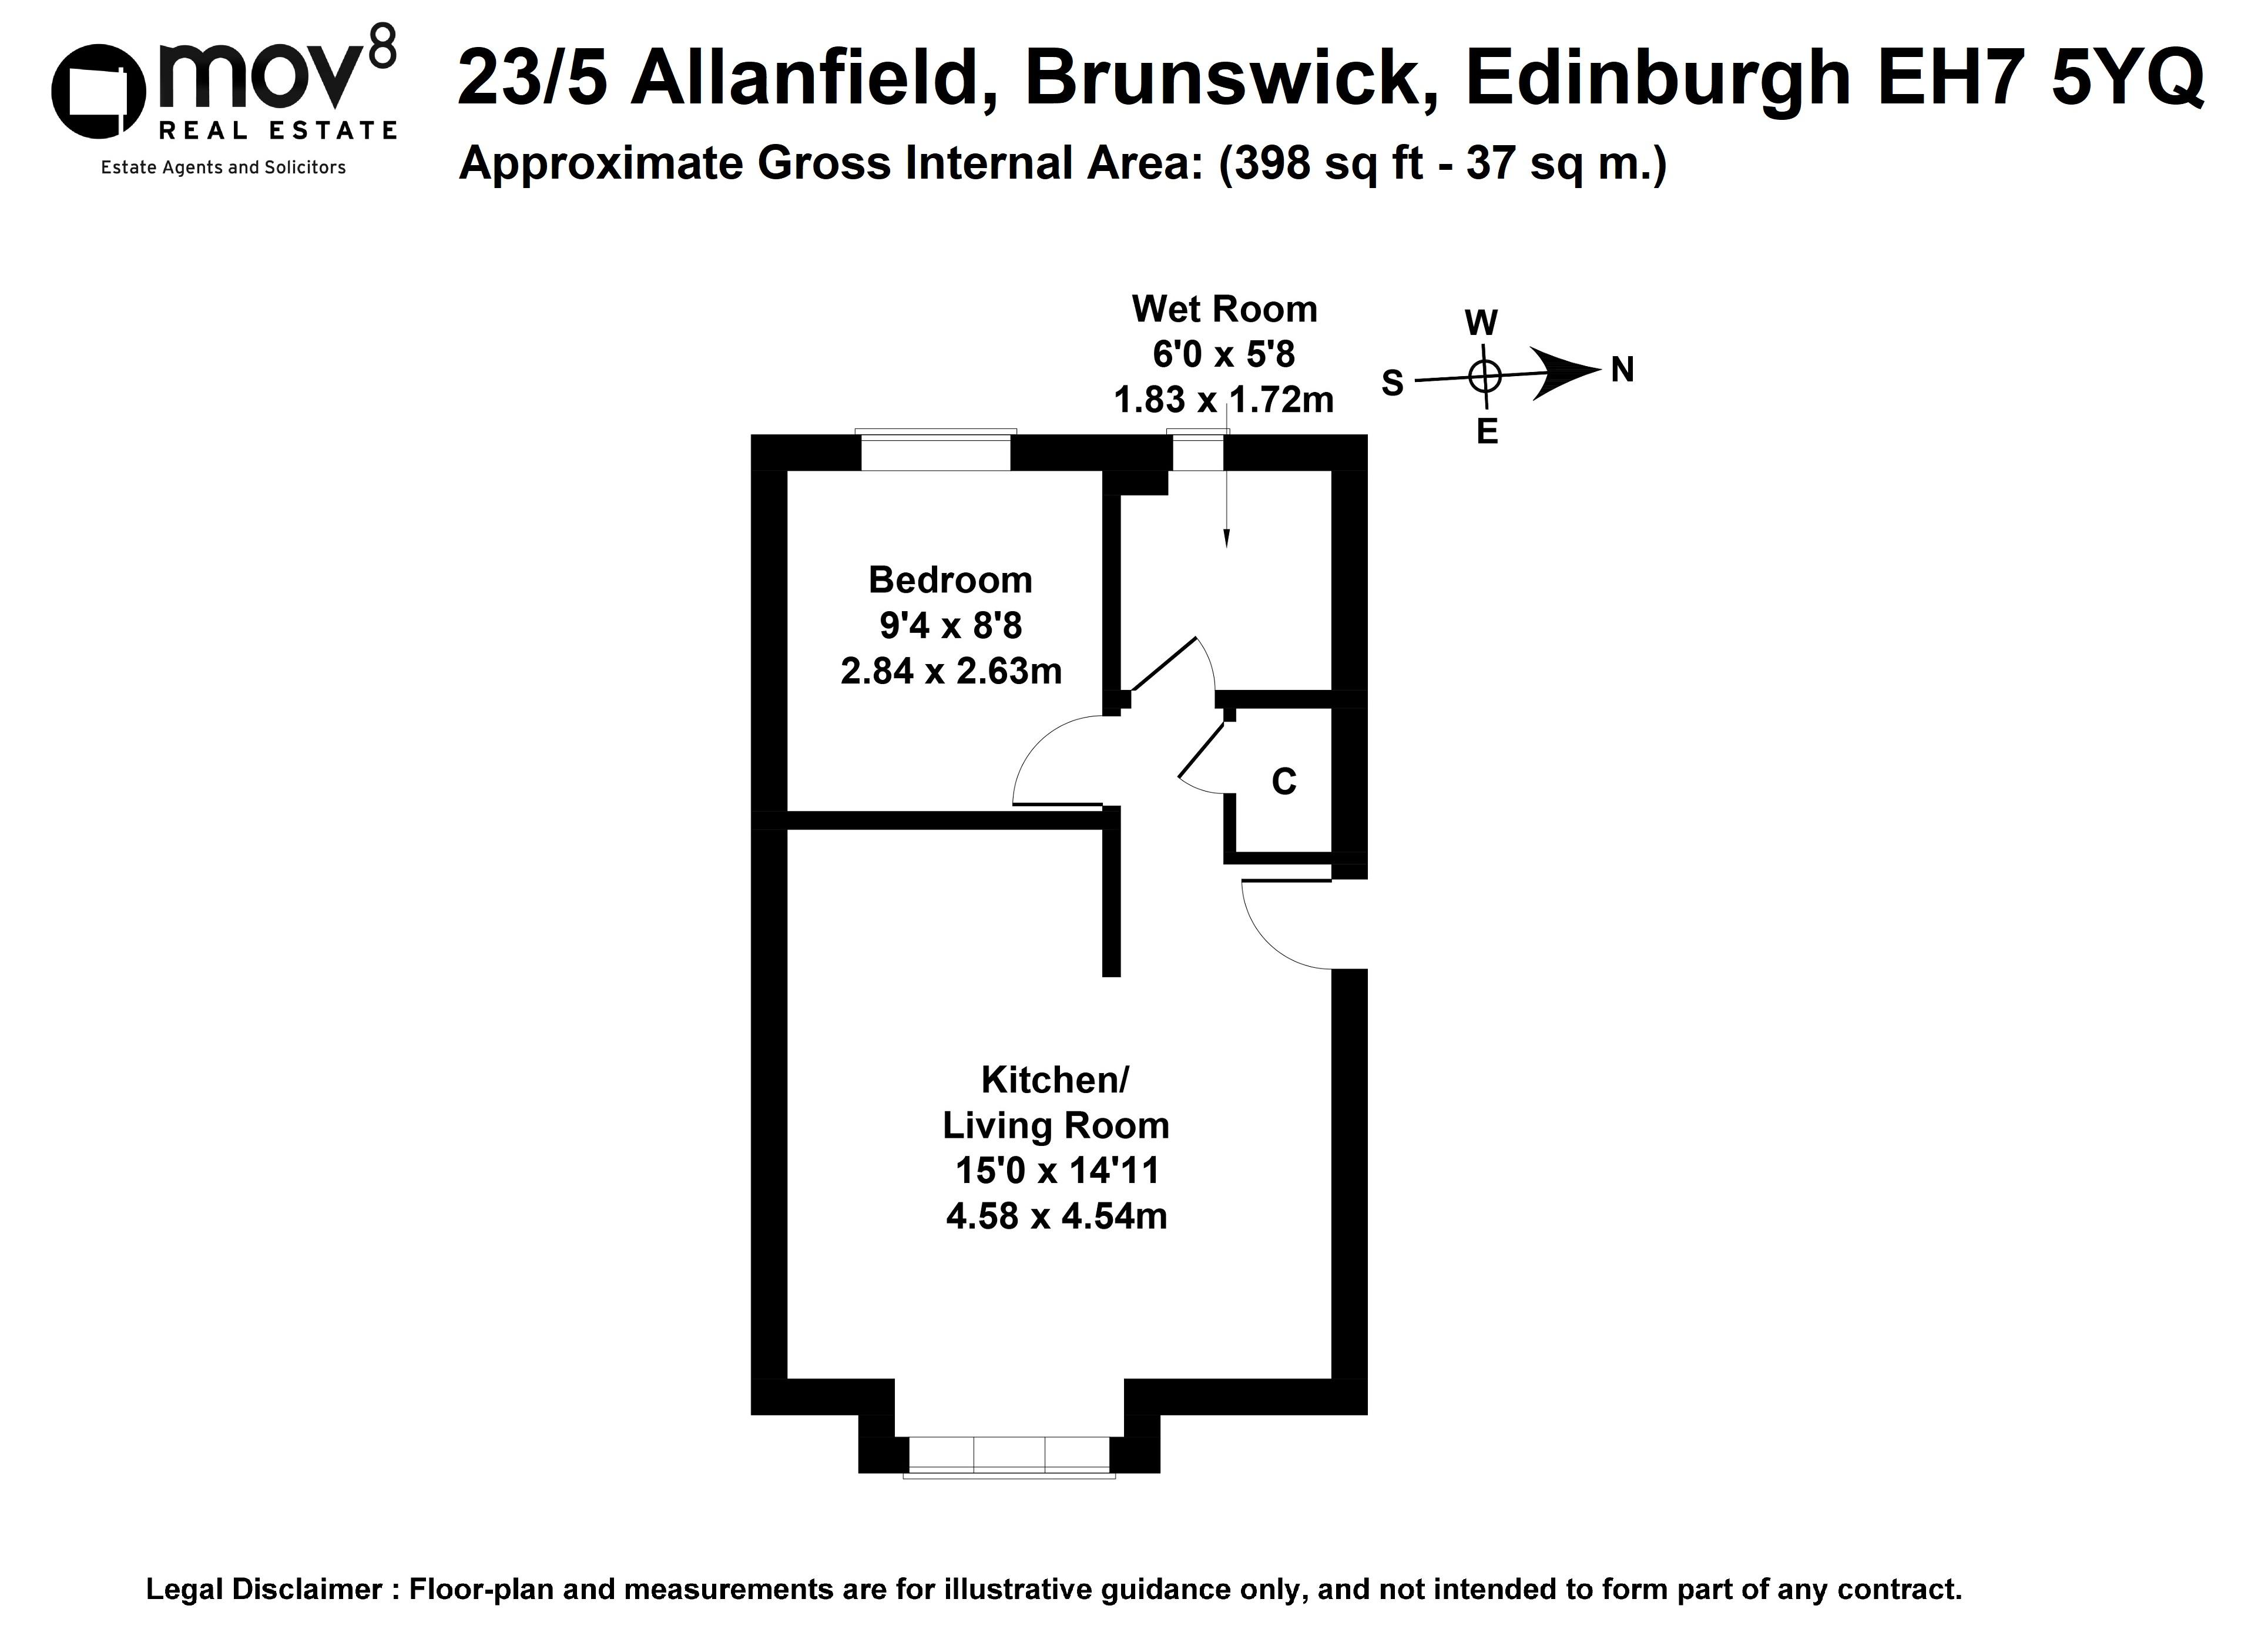 Floorplan 1 of 23/5, Allanfield, Brunswick, Edinburgh, EH7 5YQ